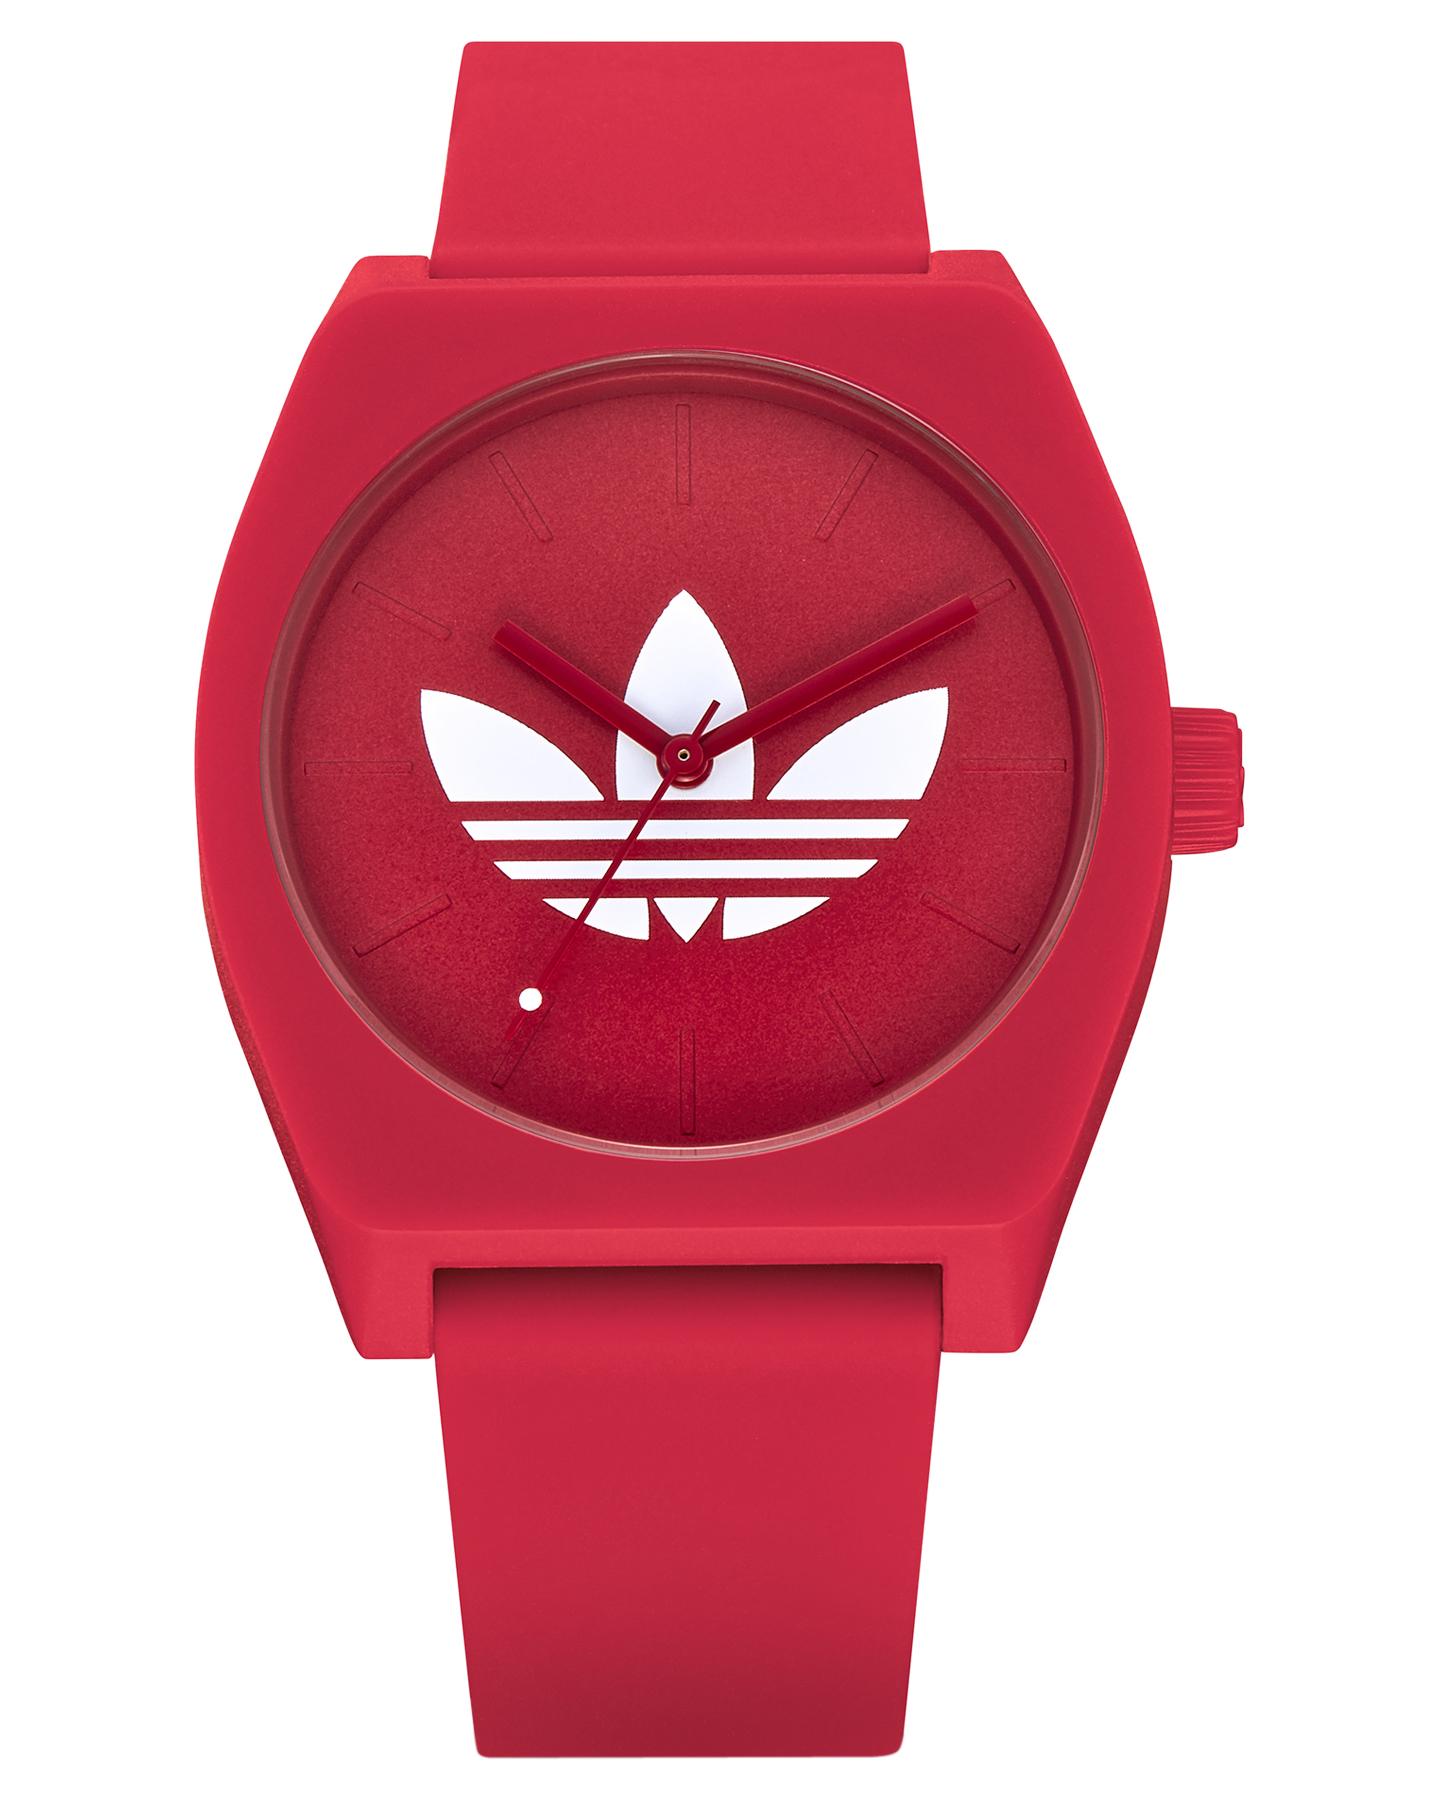 Process Sp1 Watch.